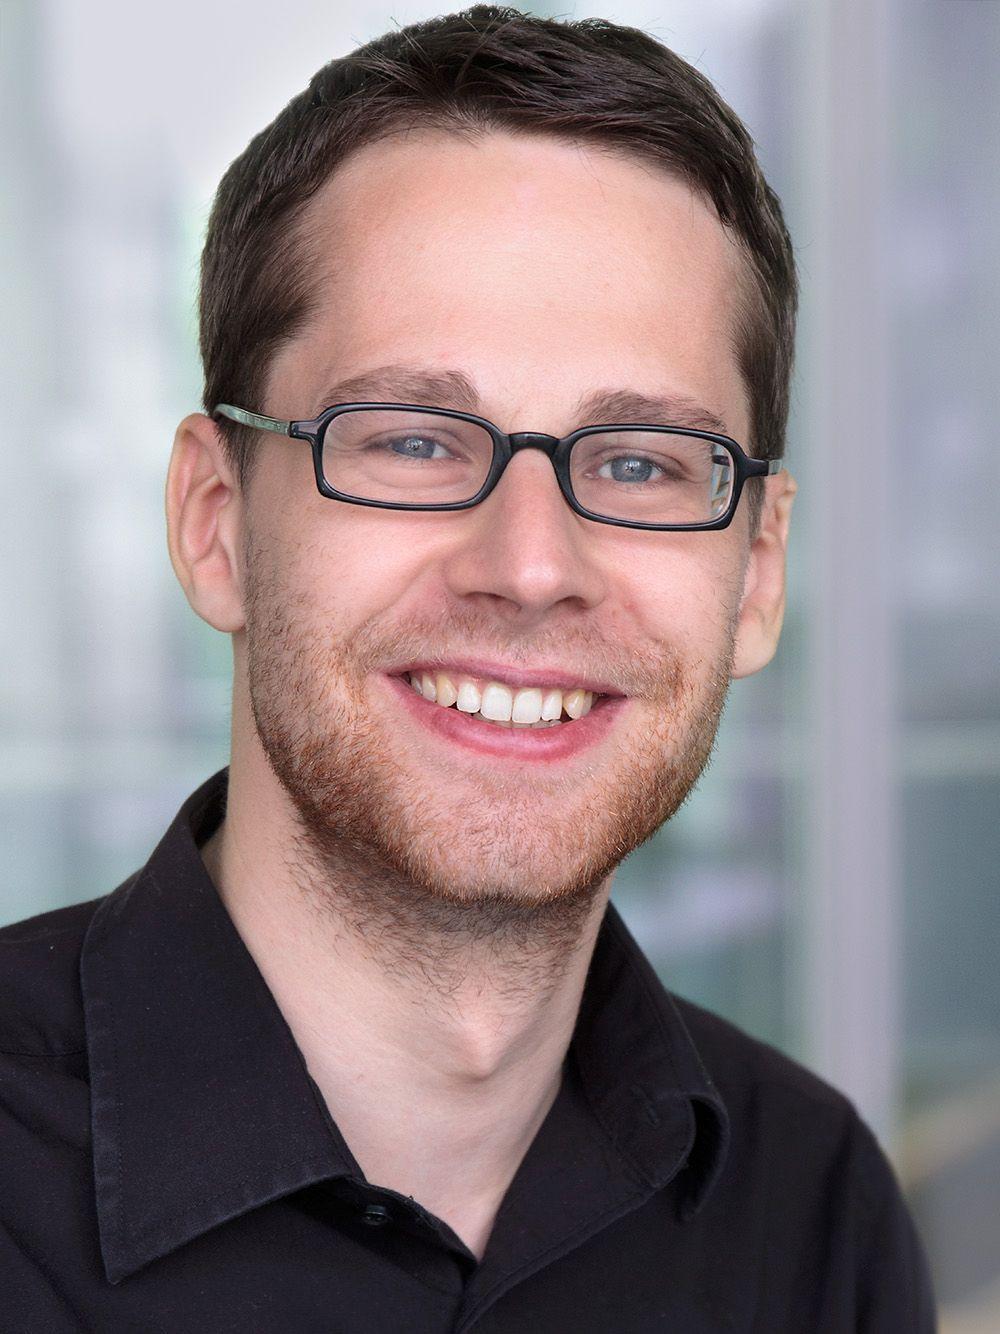 Simon Kremer